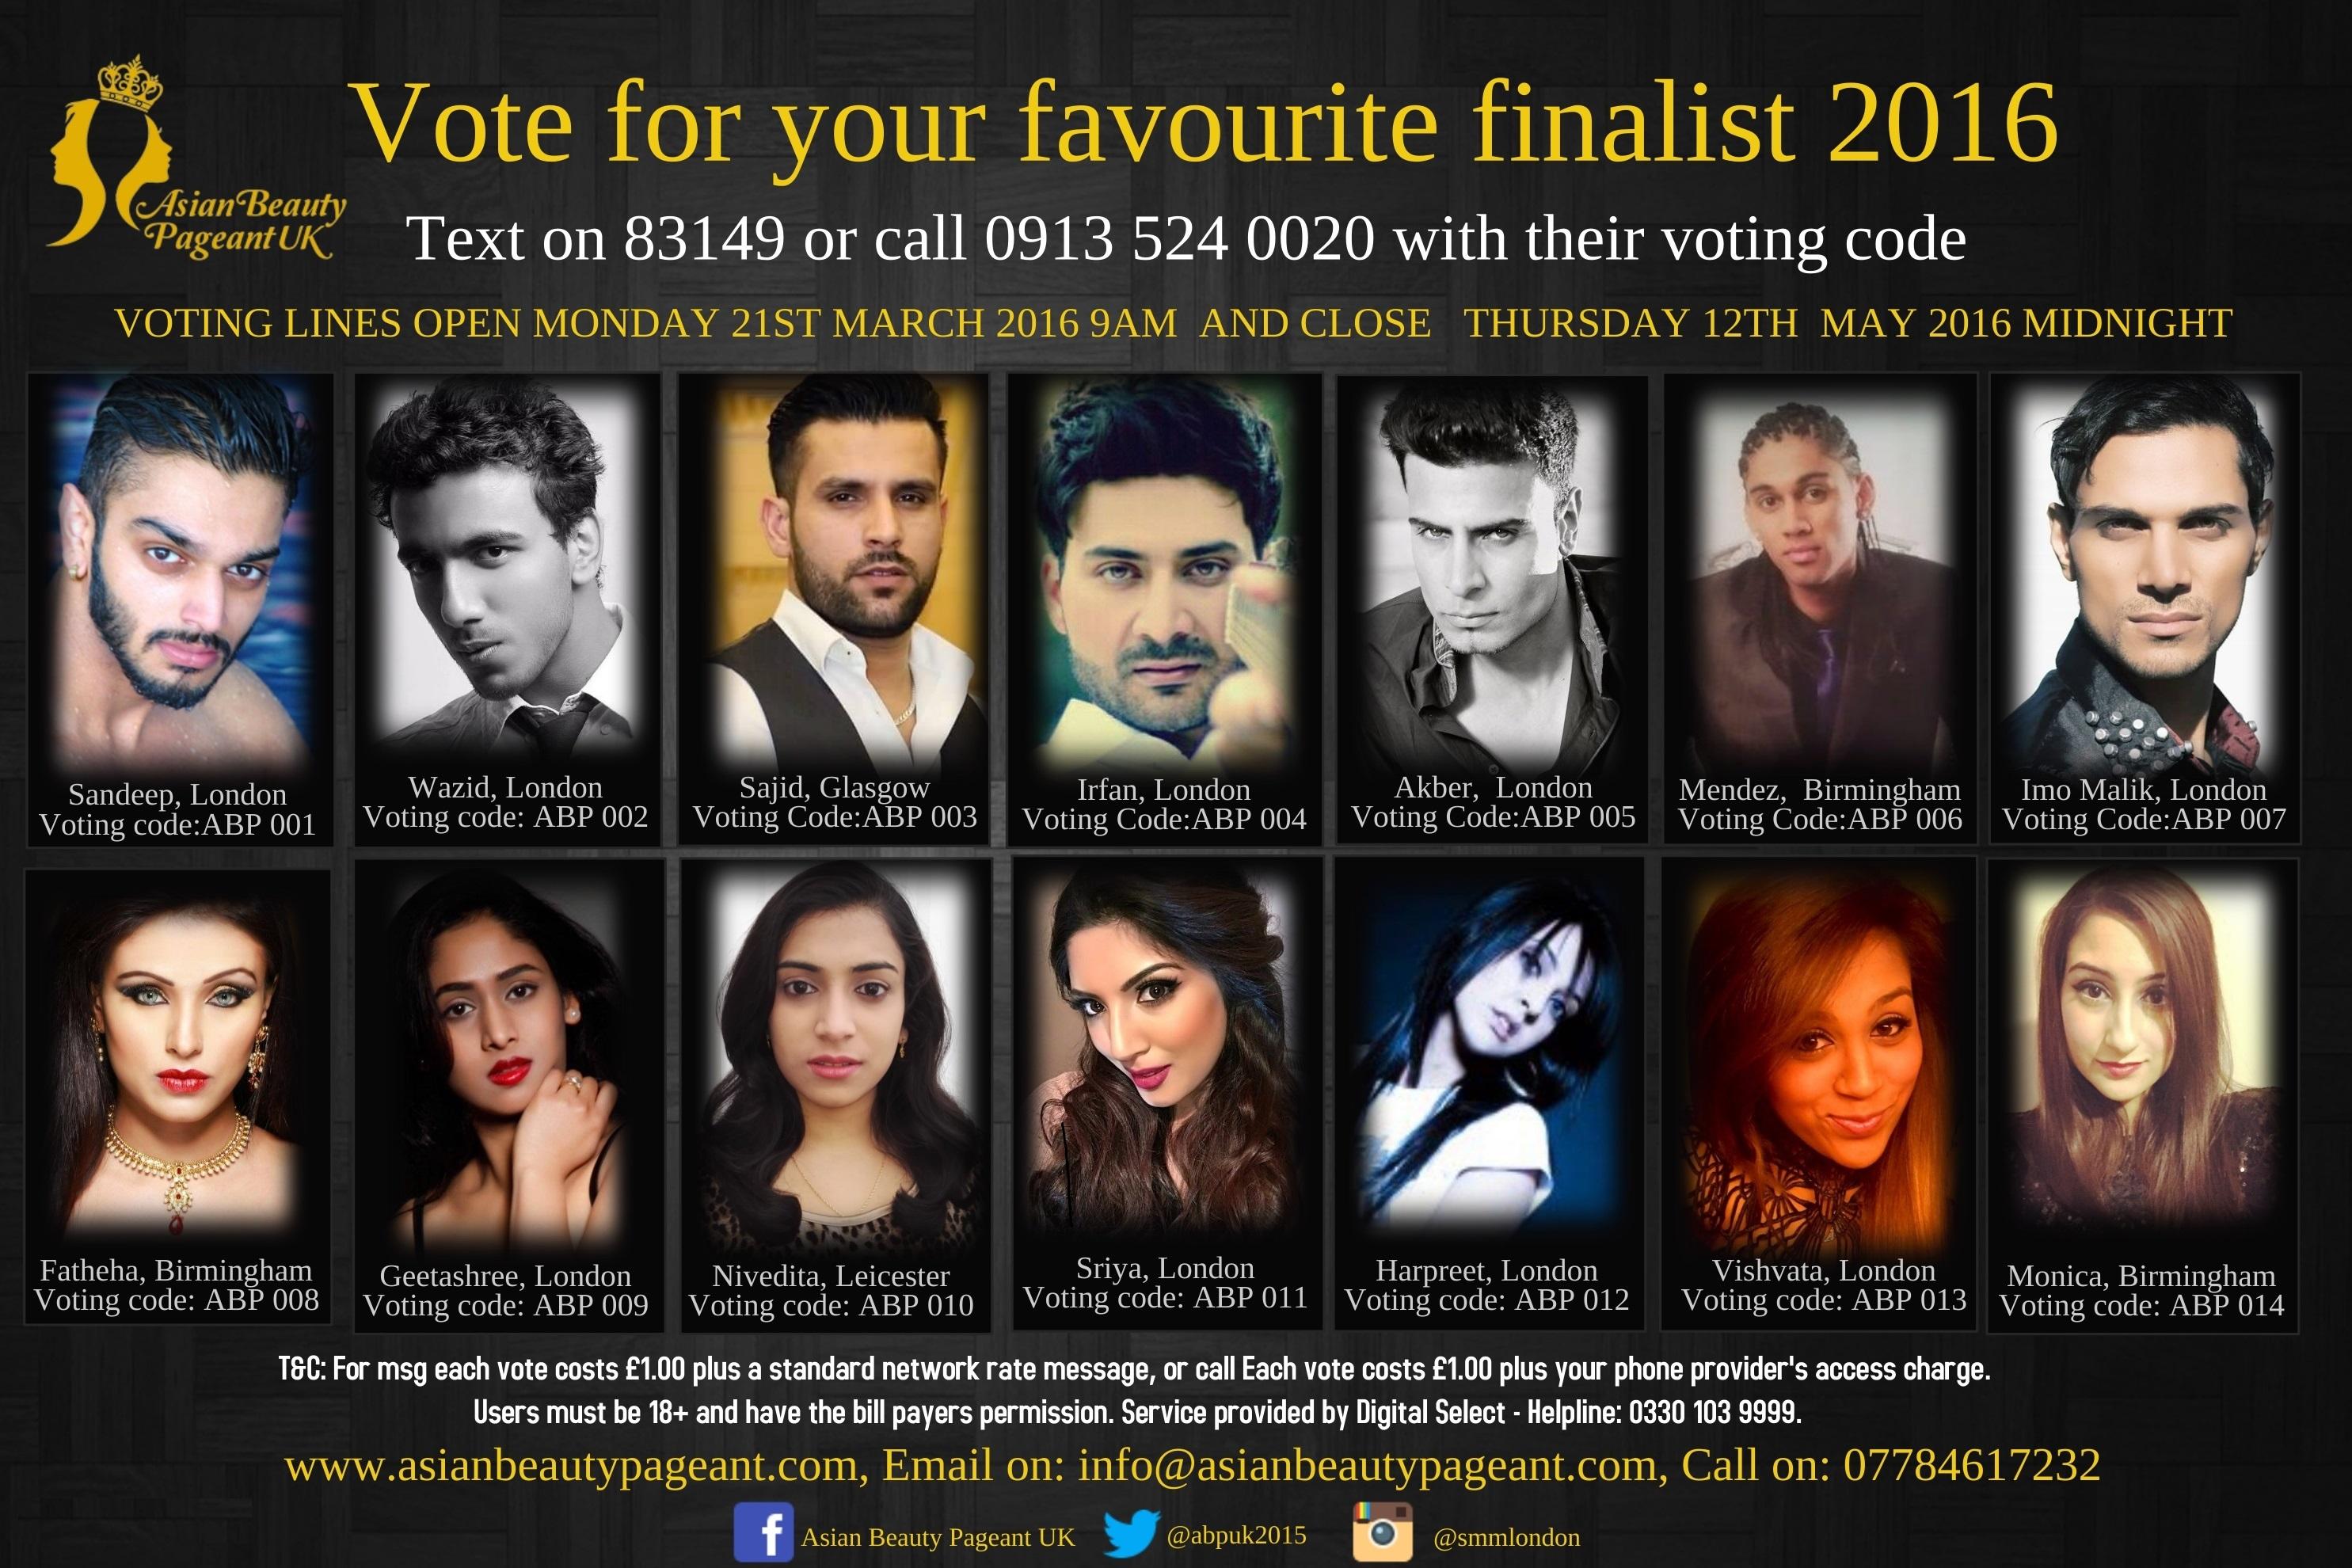 Asian Beauty Pageant UK 2016 Finalists